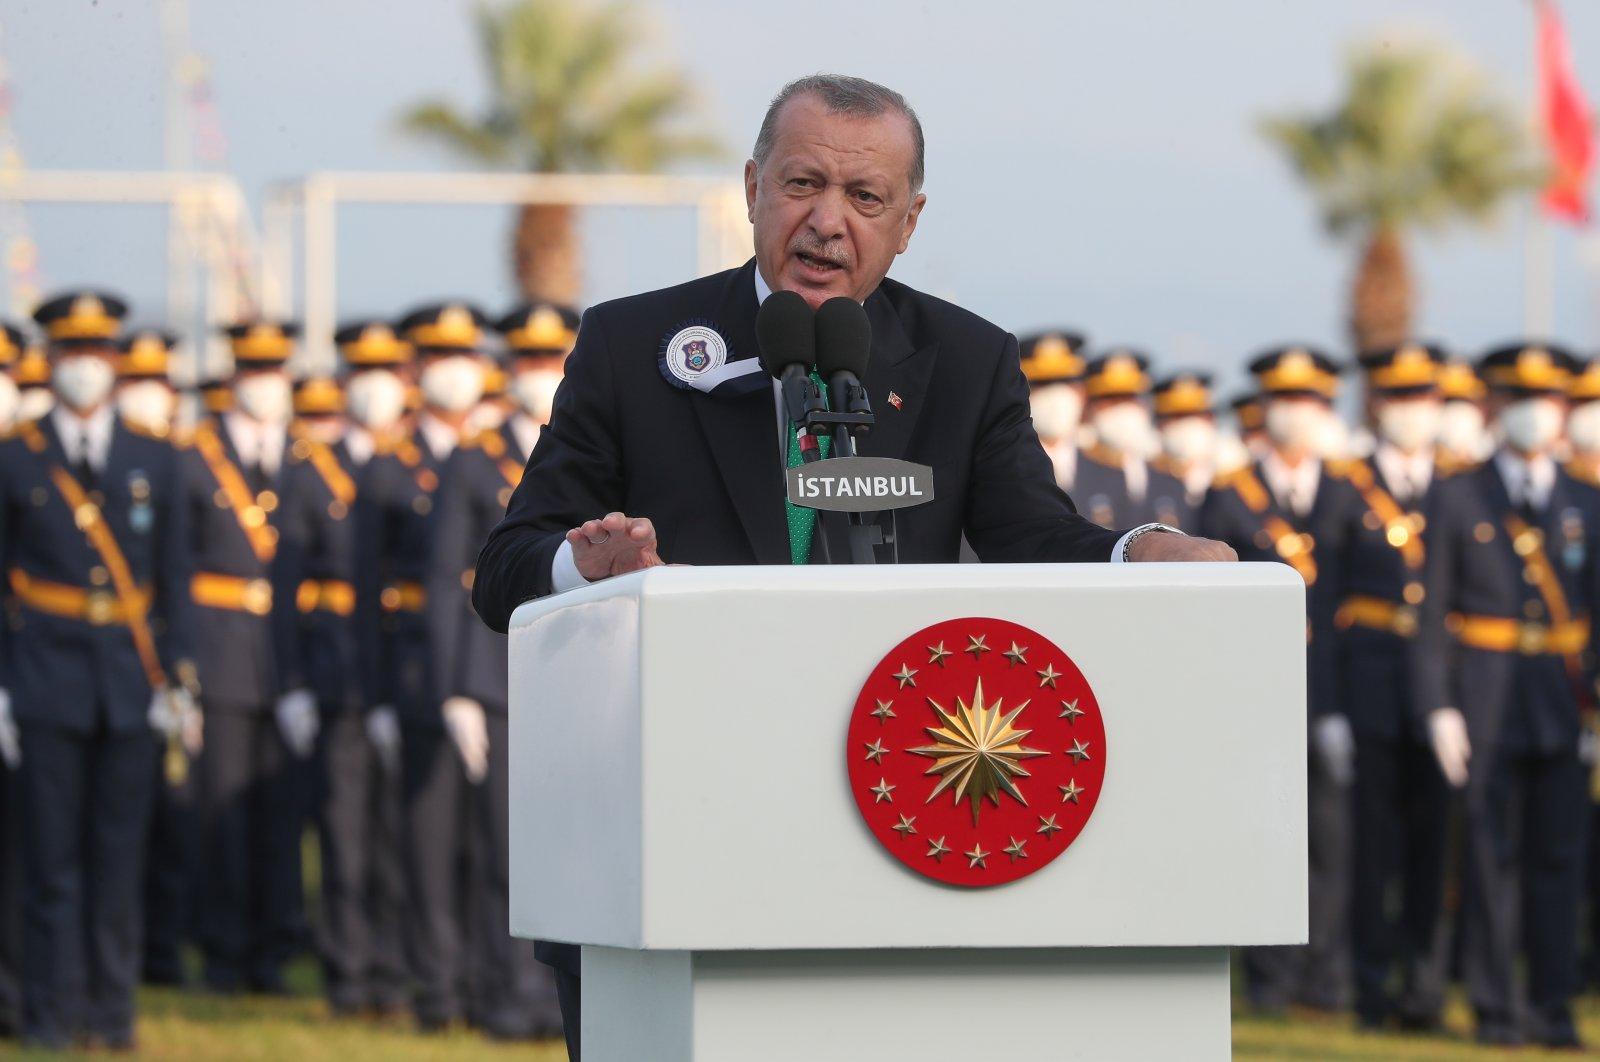 President Recep Tayyip Erdoğan speaks at the graduation ceremony of the Defense Ministry's cadet school in Istanbul, Turkey, Aug. 31, 2021. (DHA Photo)